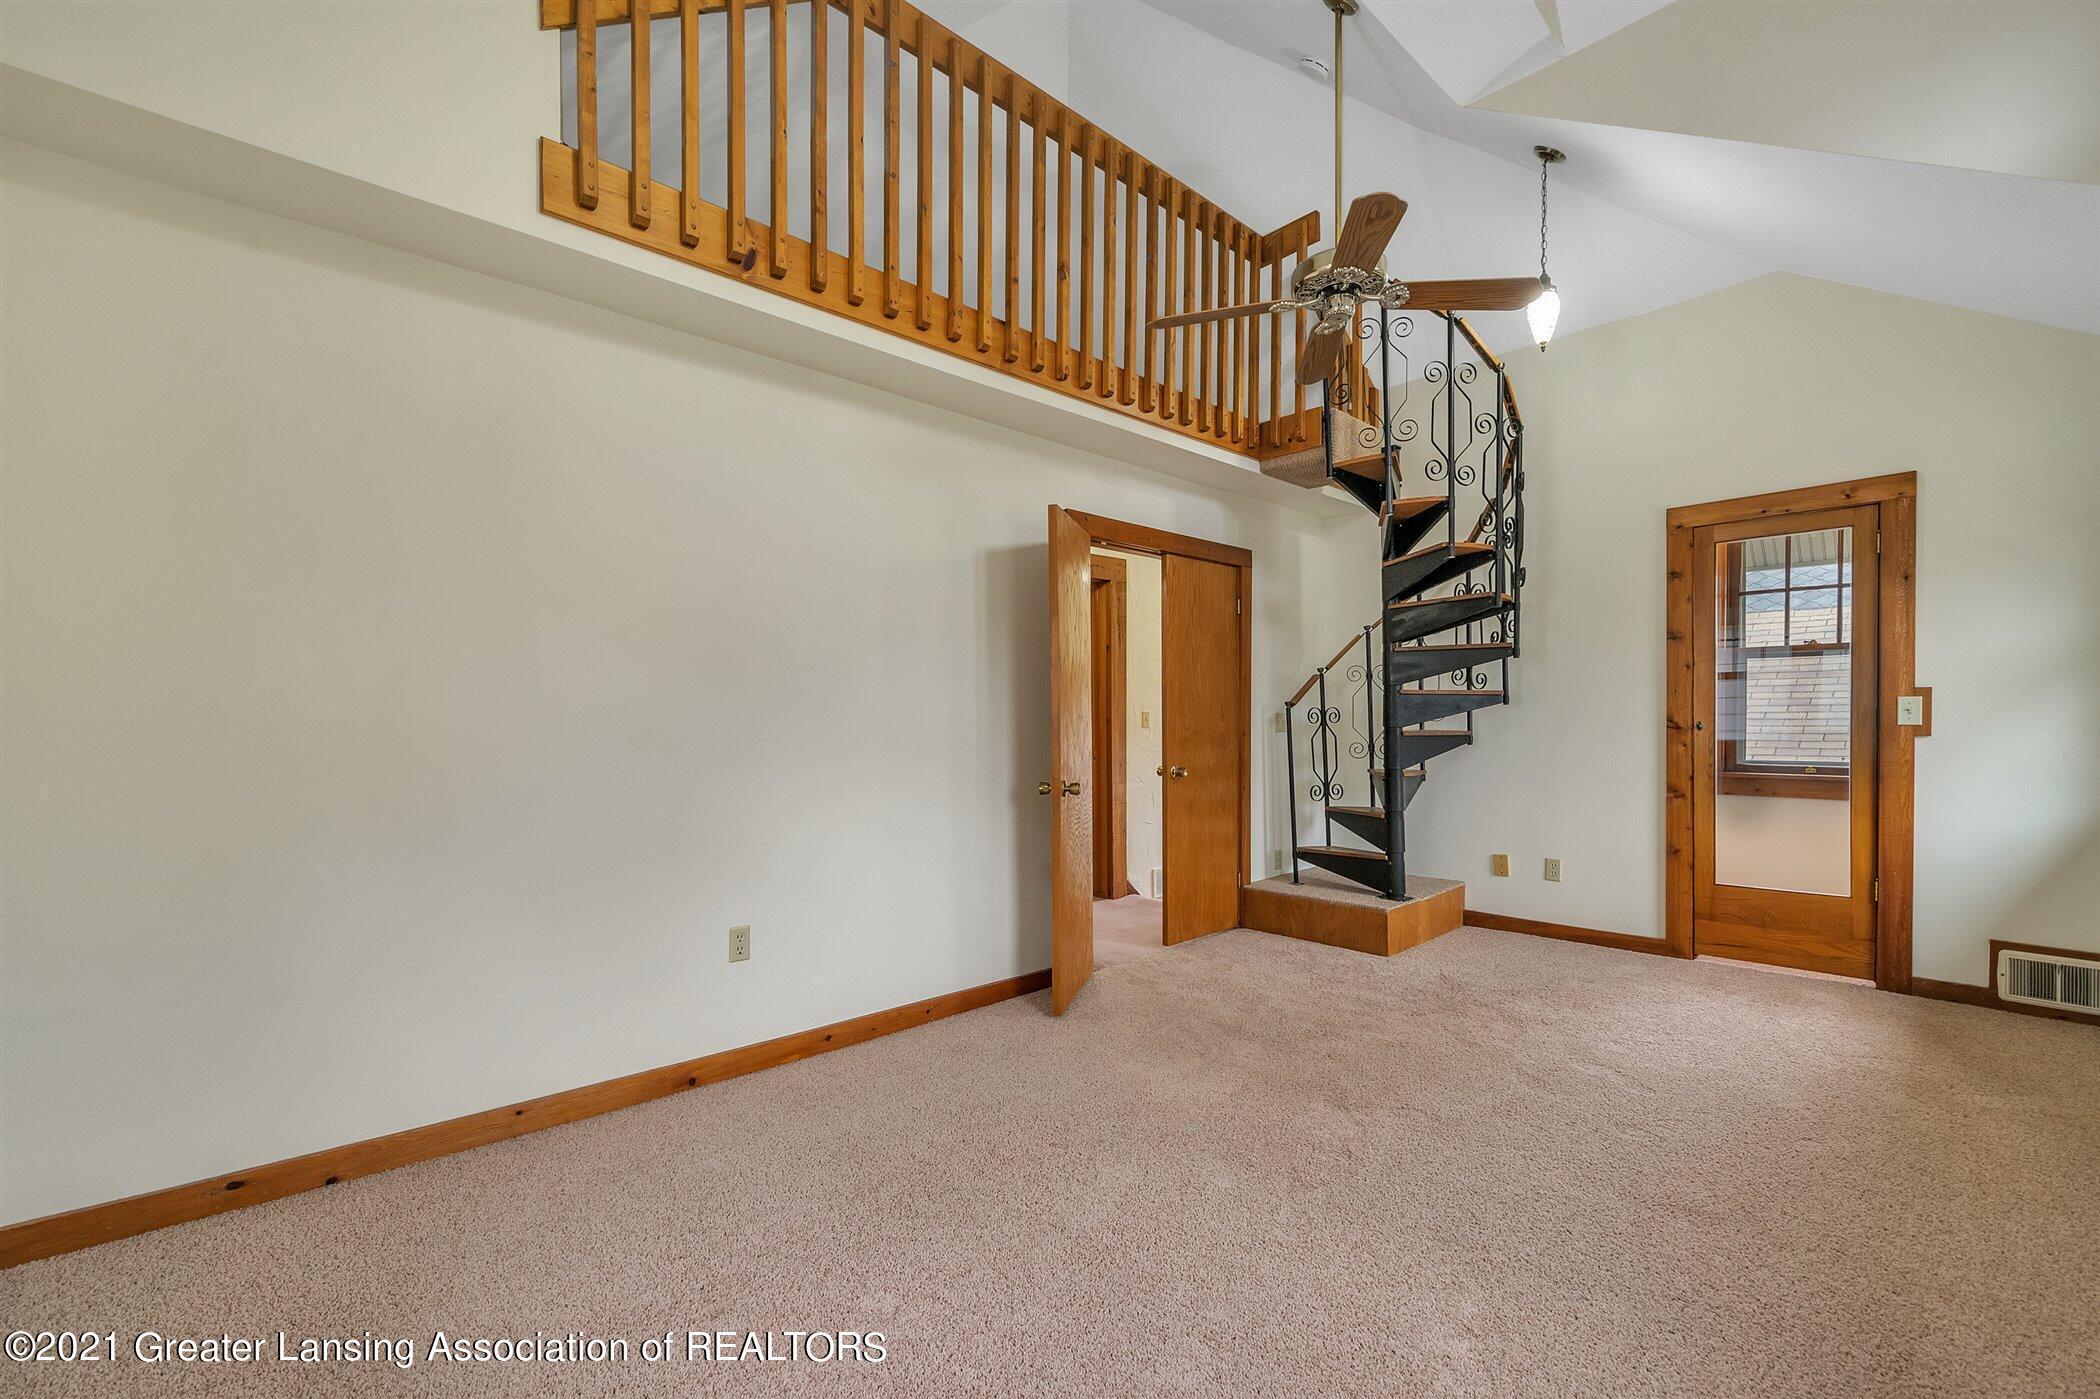 726 N Magnolia Ave - (12) UPPER LEVEL Primary Bedroom - 15